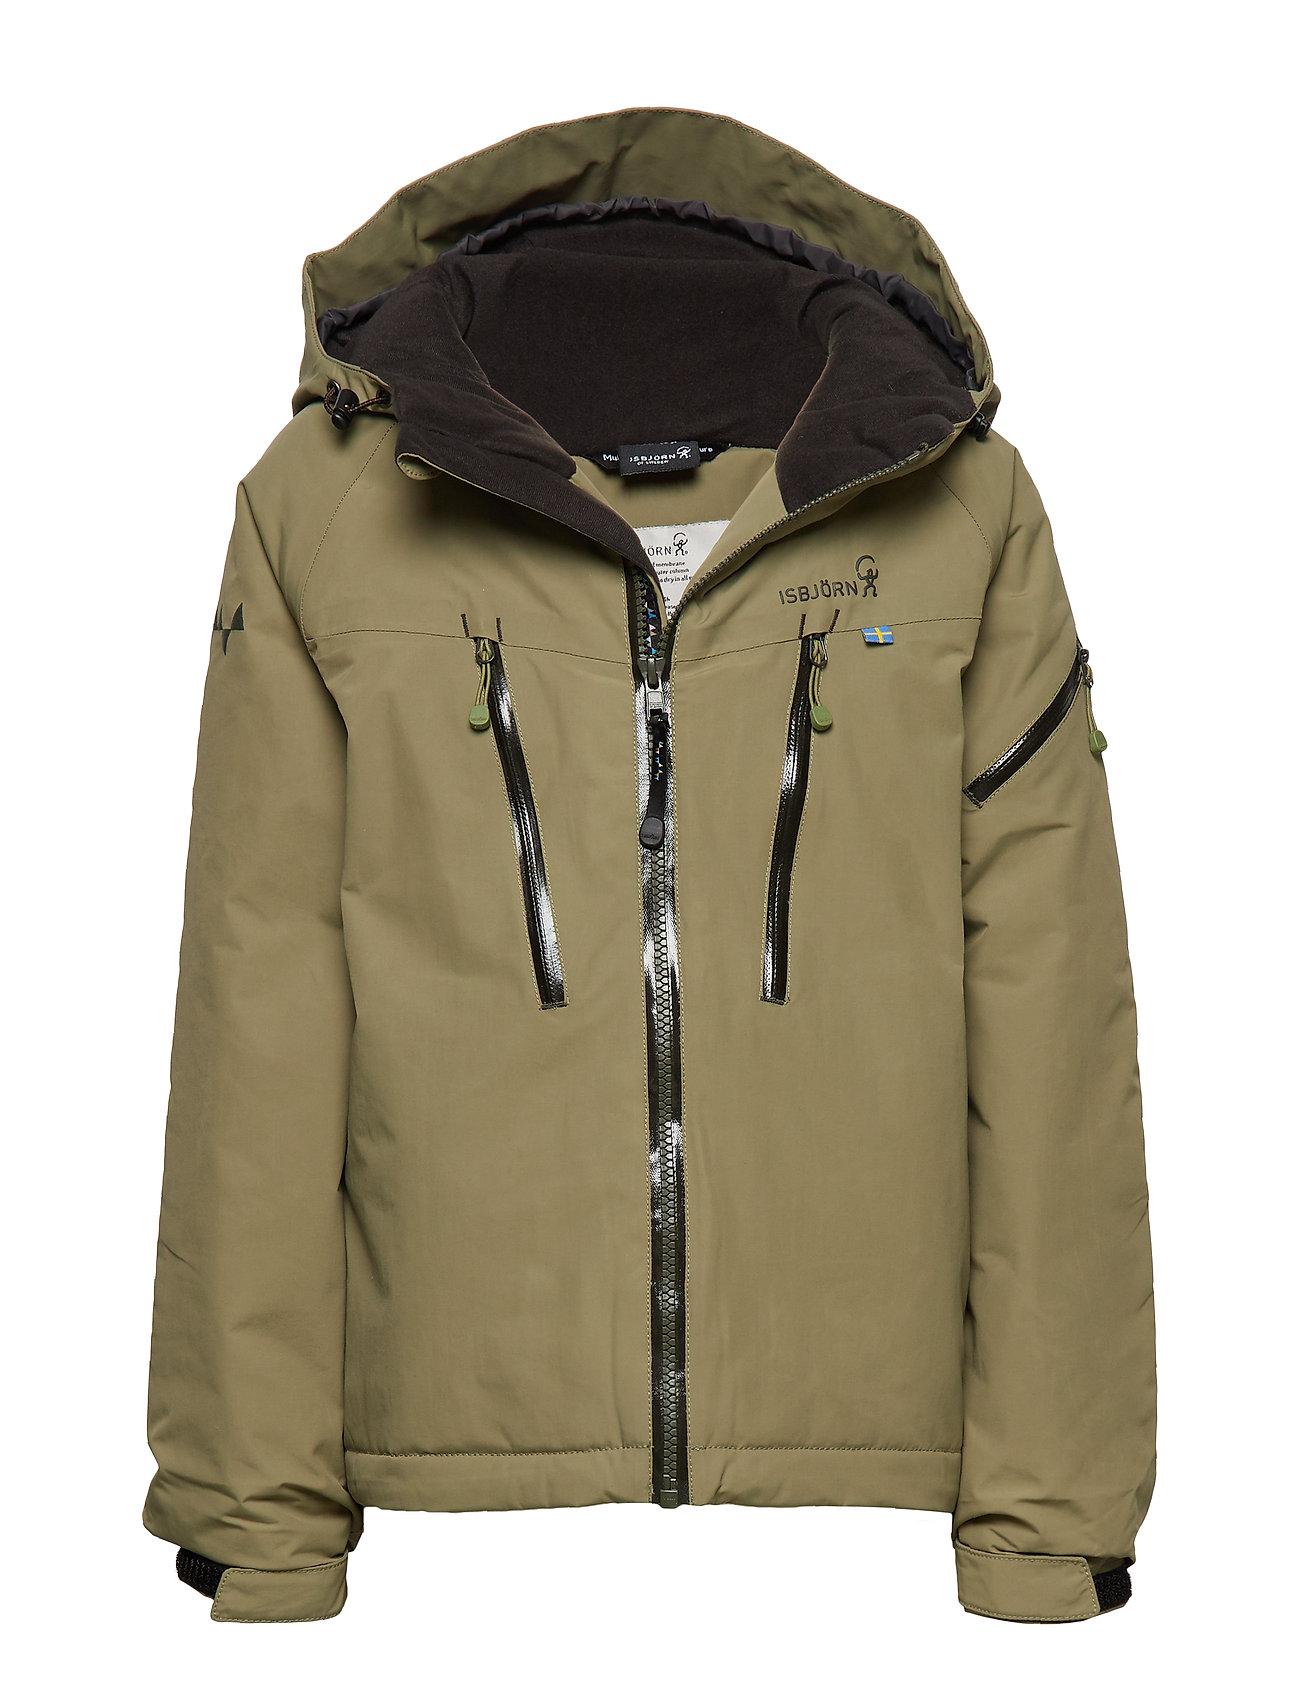 ISBJÖRN of Sweden CARVING Winter Jacket - MOSS